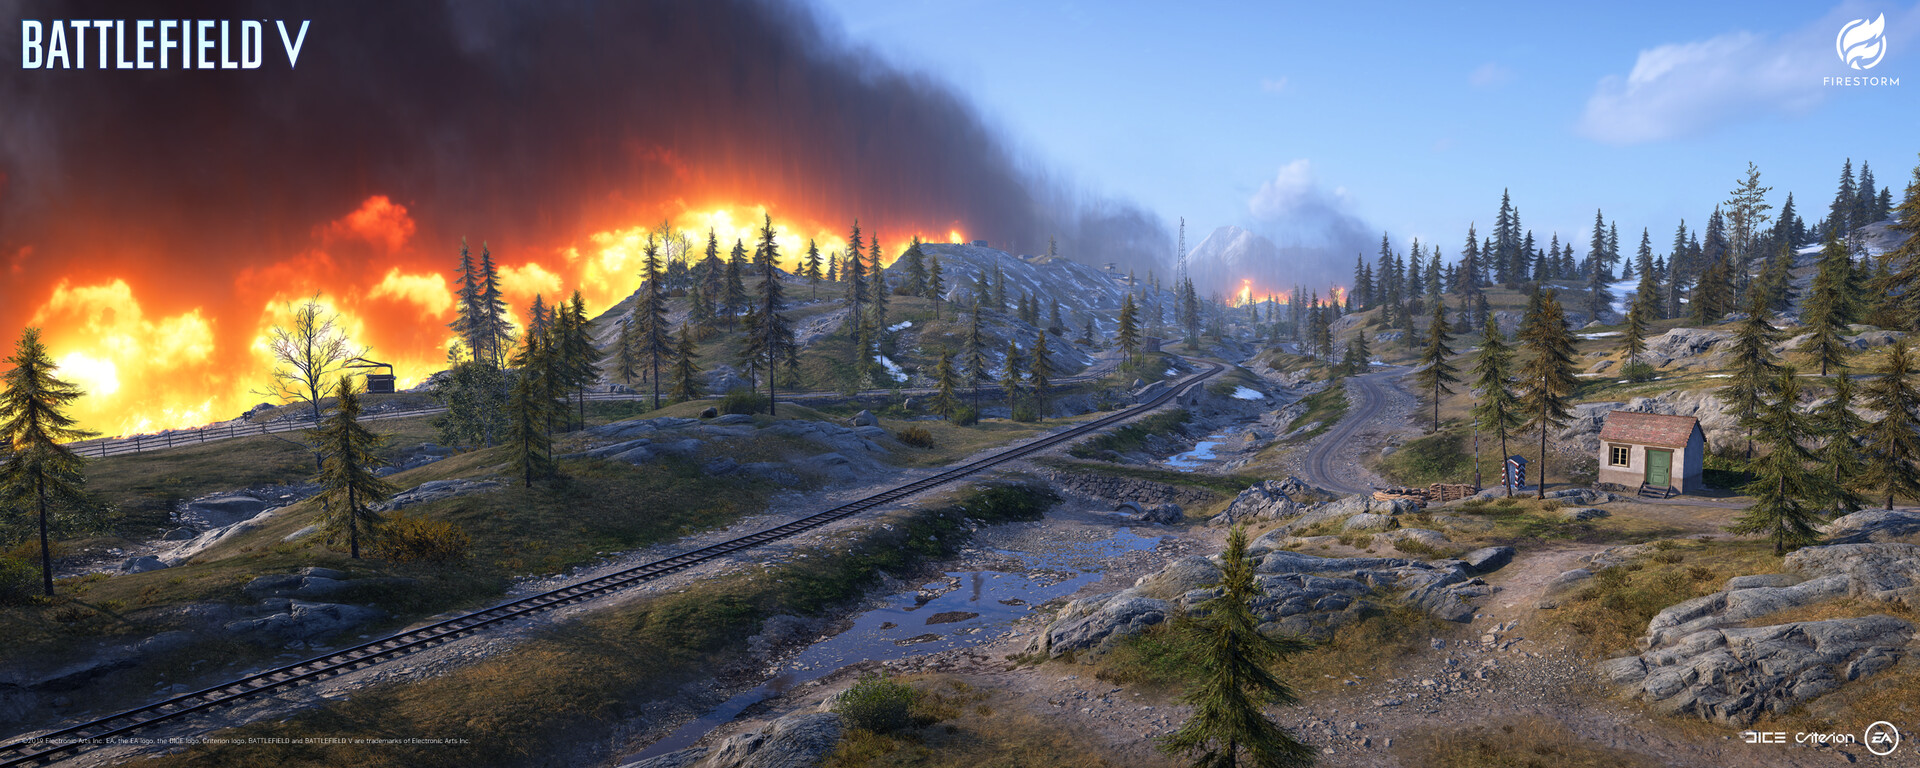 BATTLEFIELD V: FIRESTORM – Halvøy Level Art